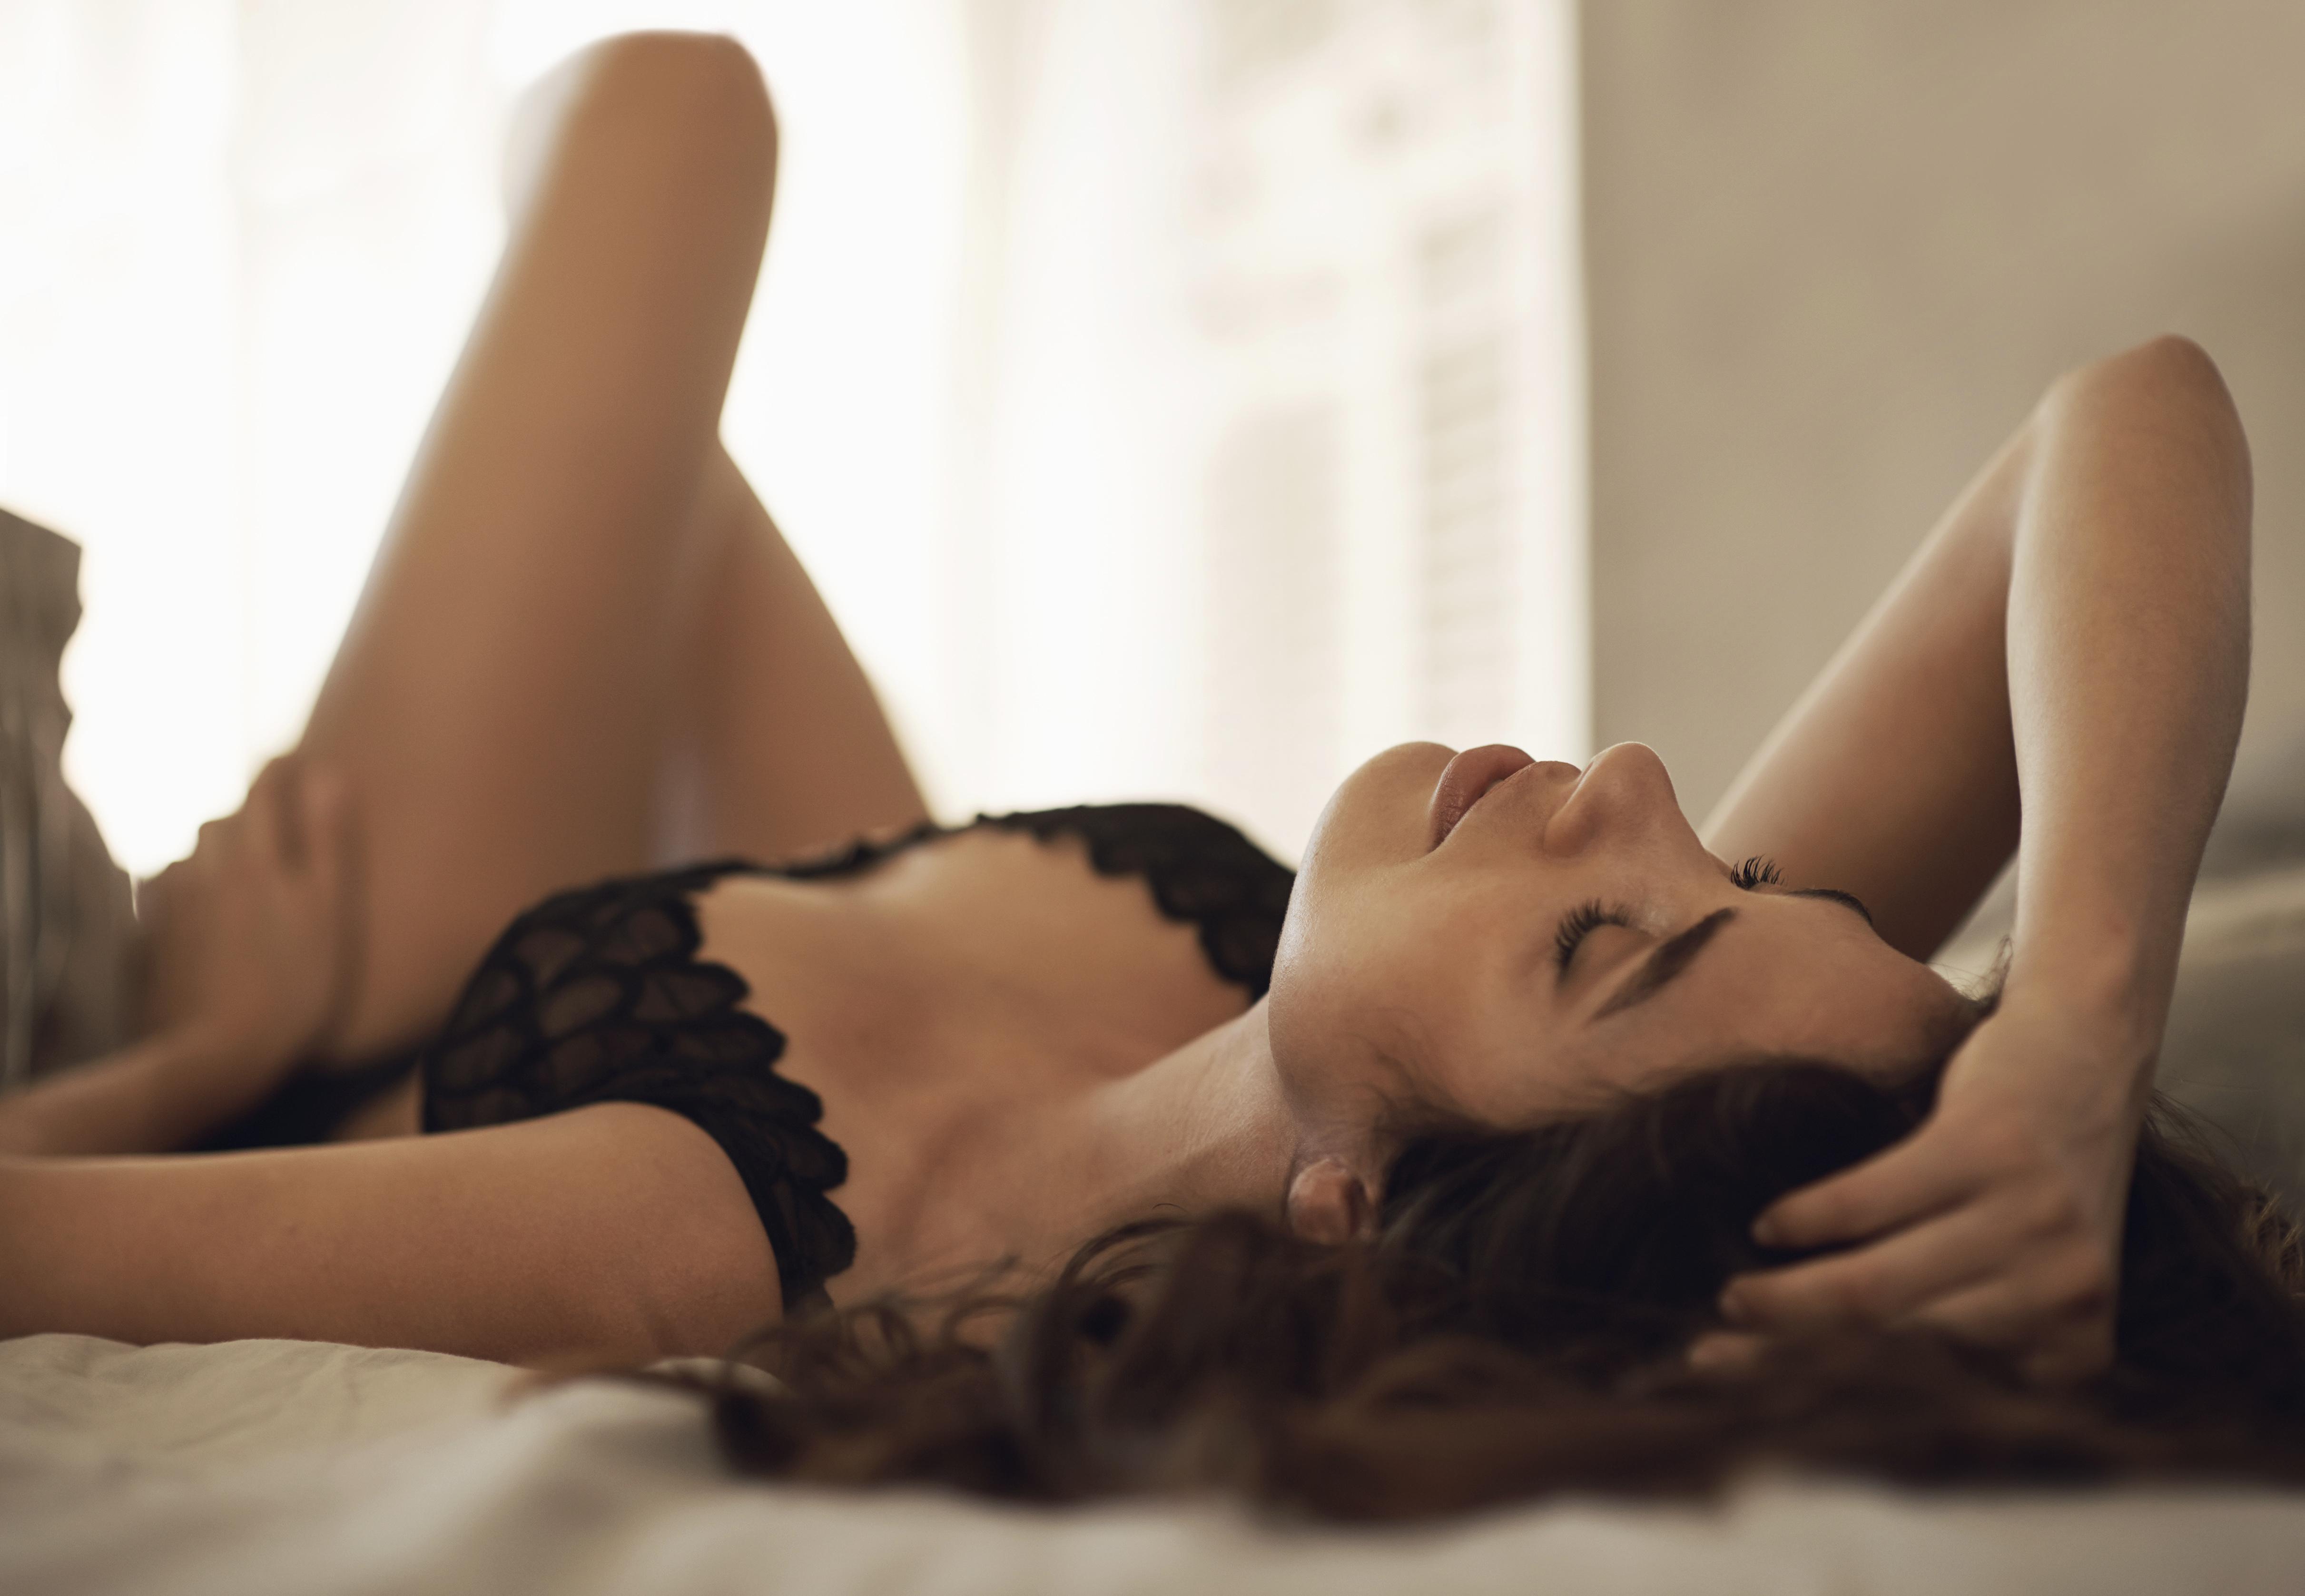 Good lesbian porn sites for women